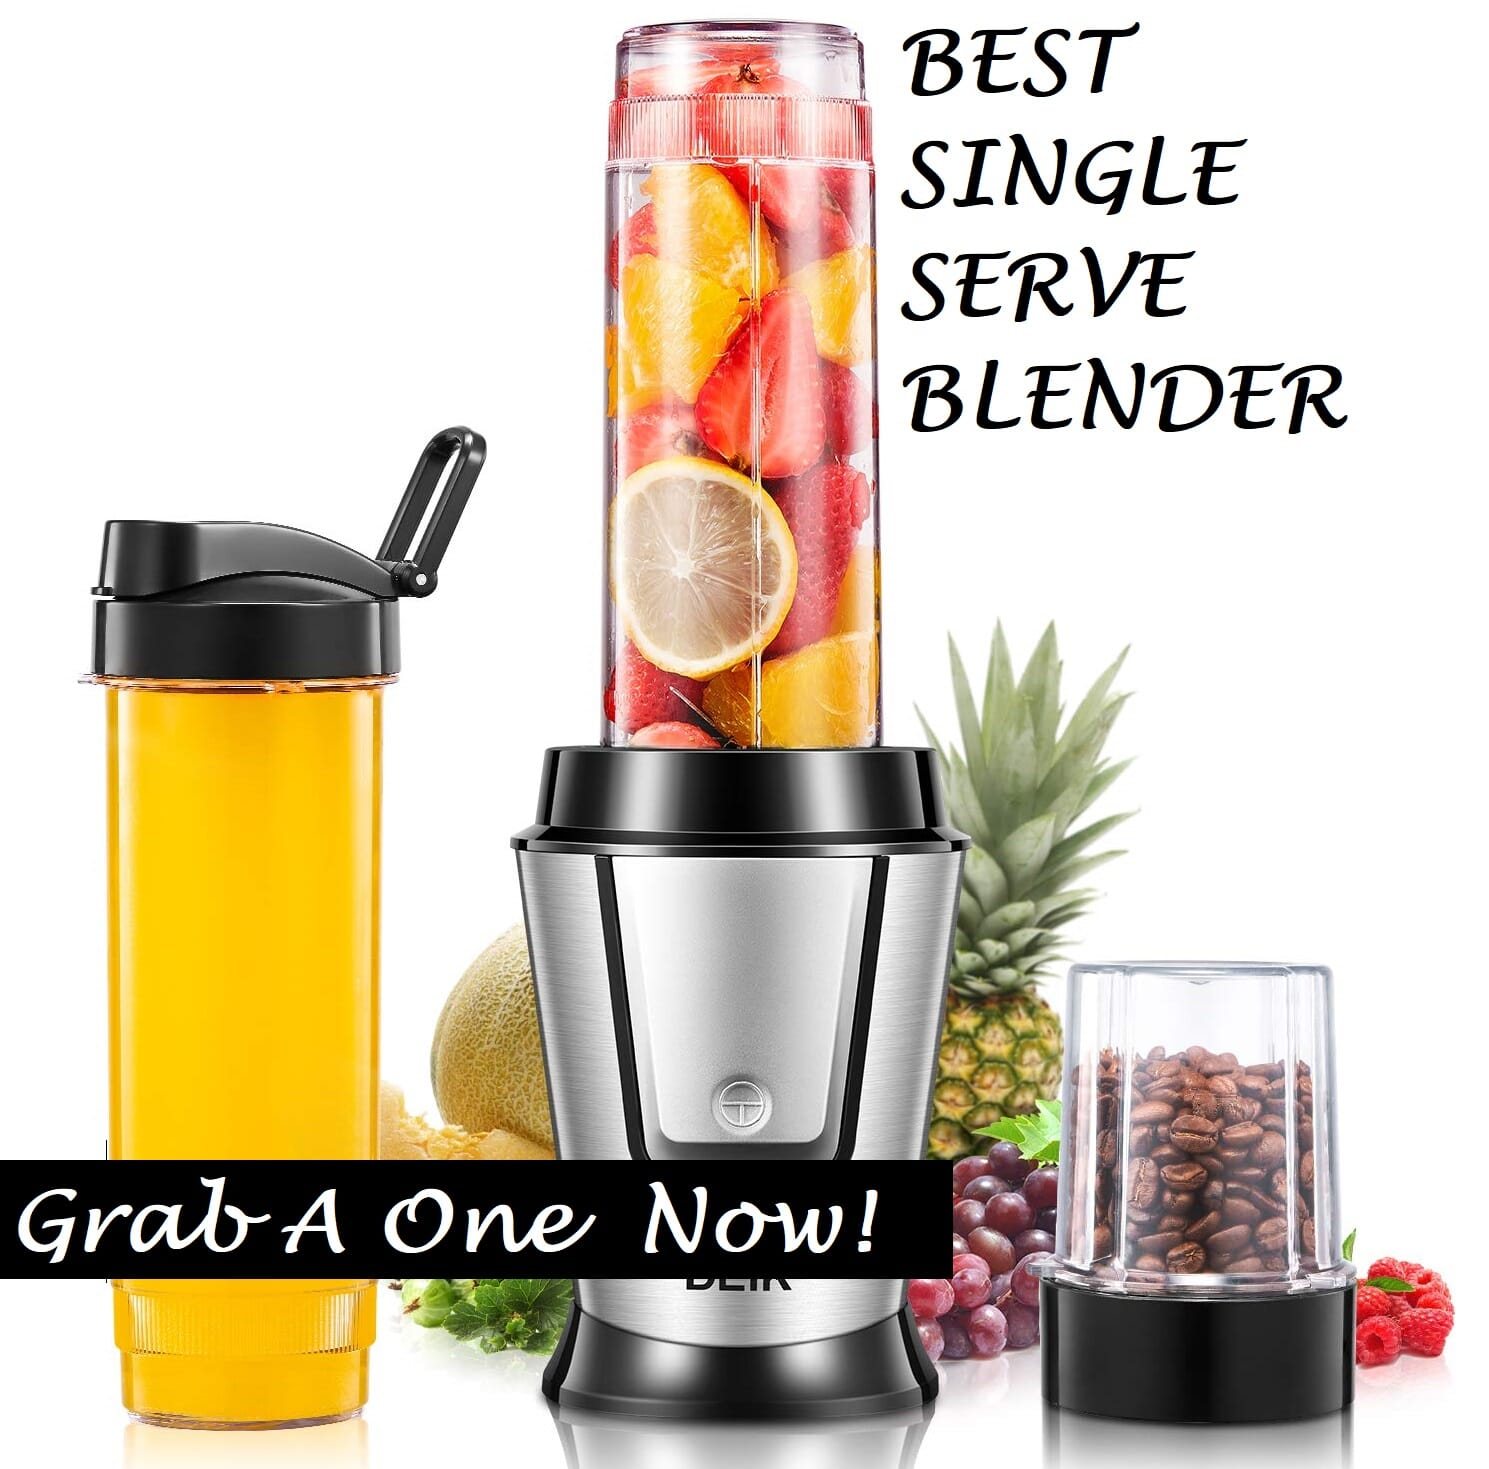 best single serve blender